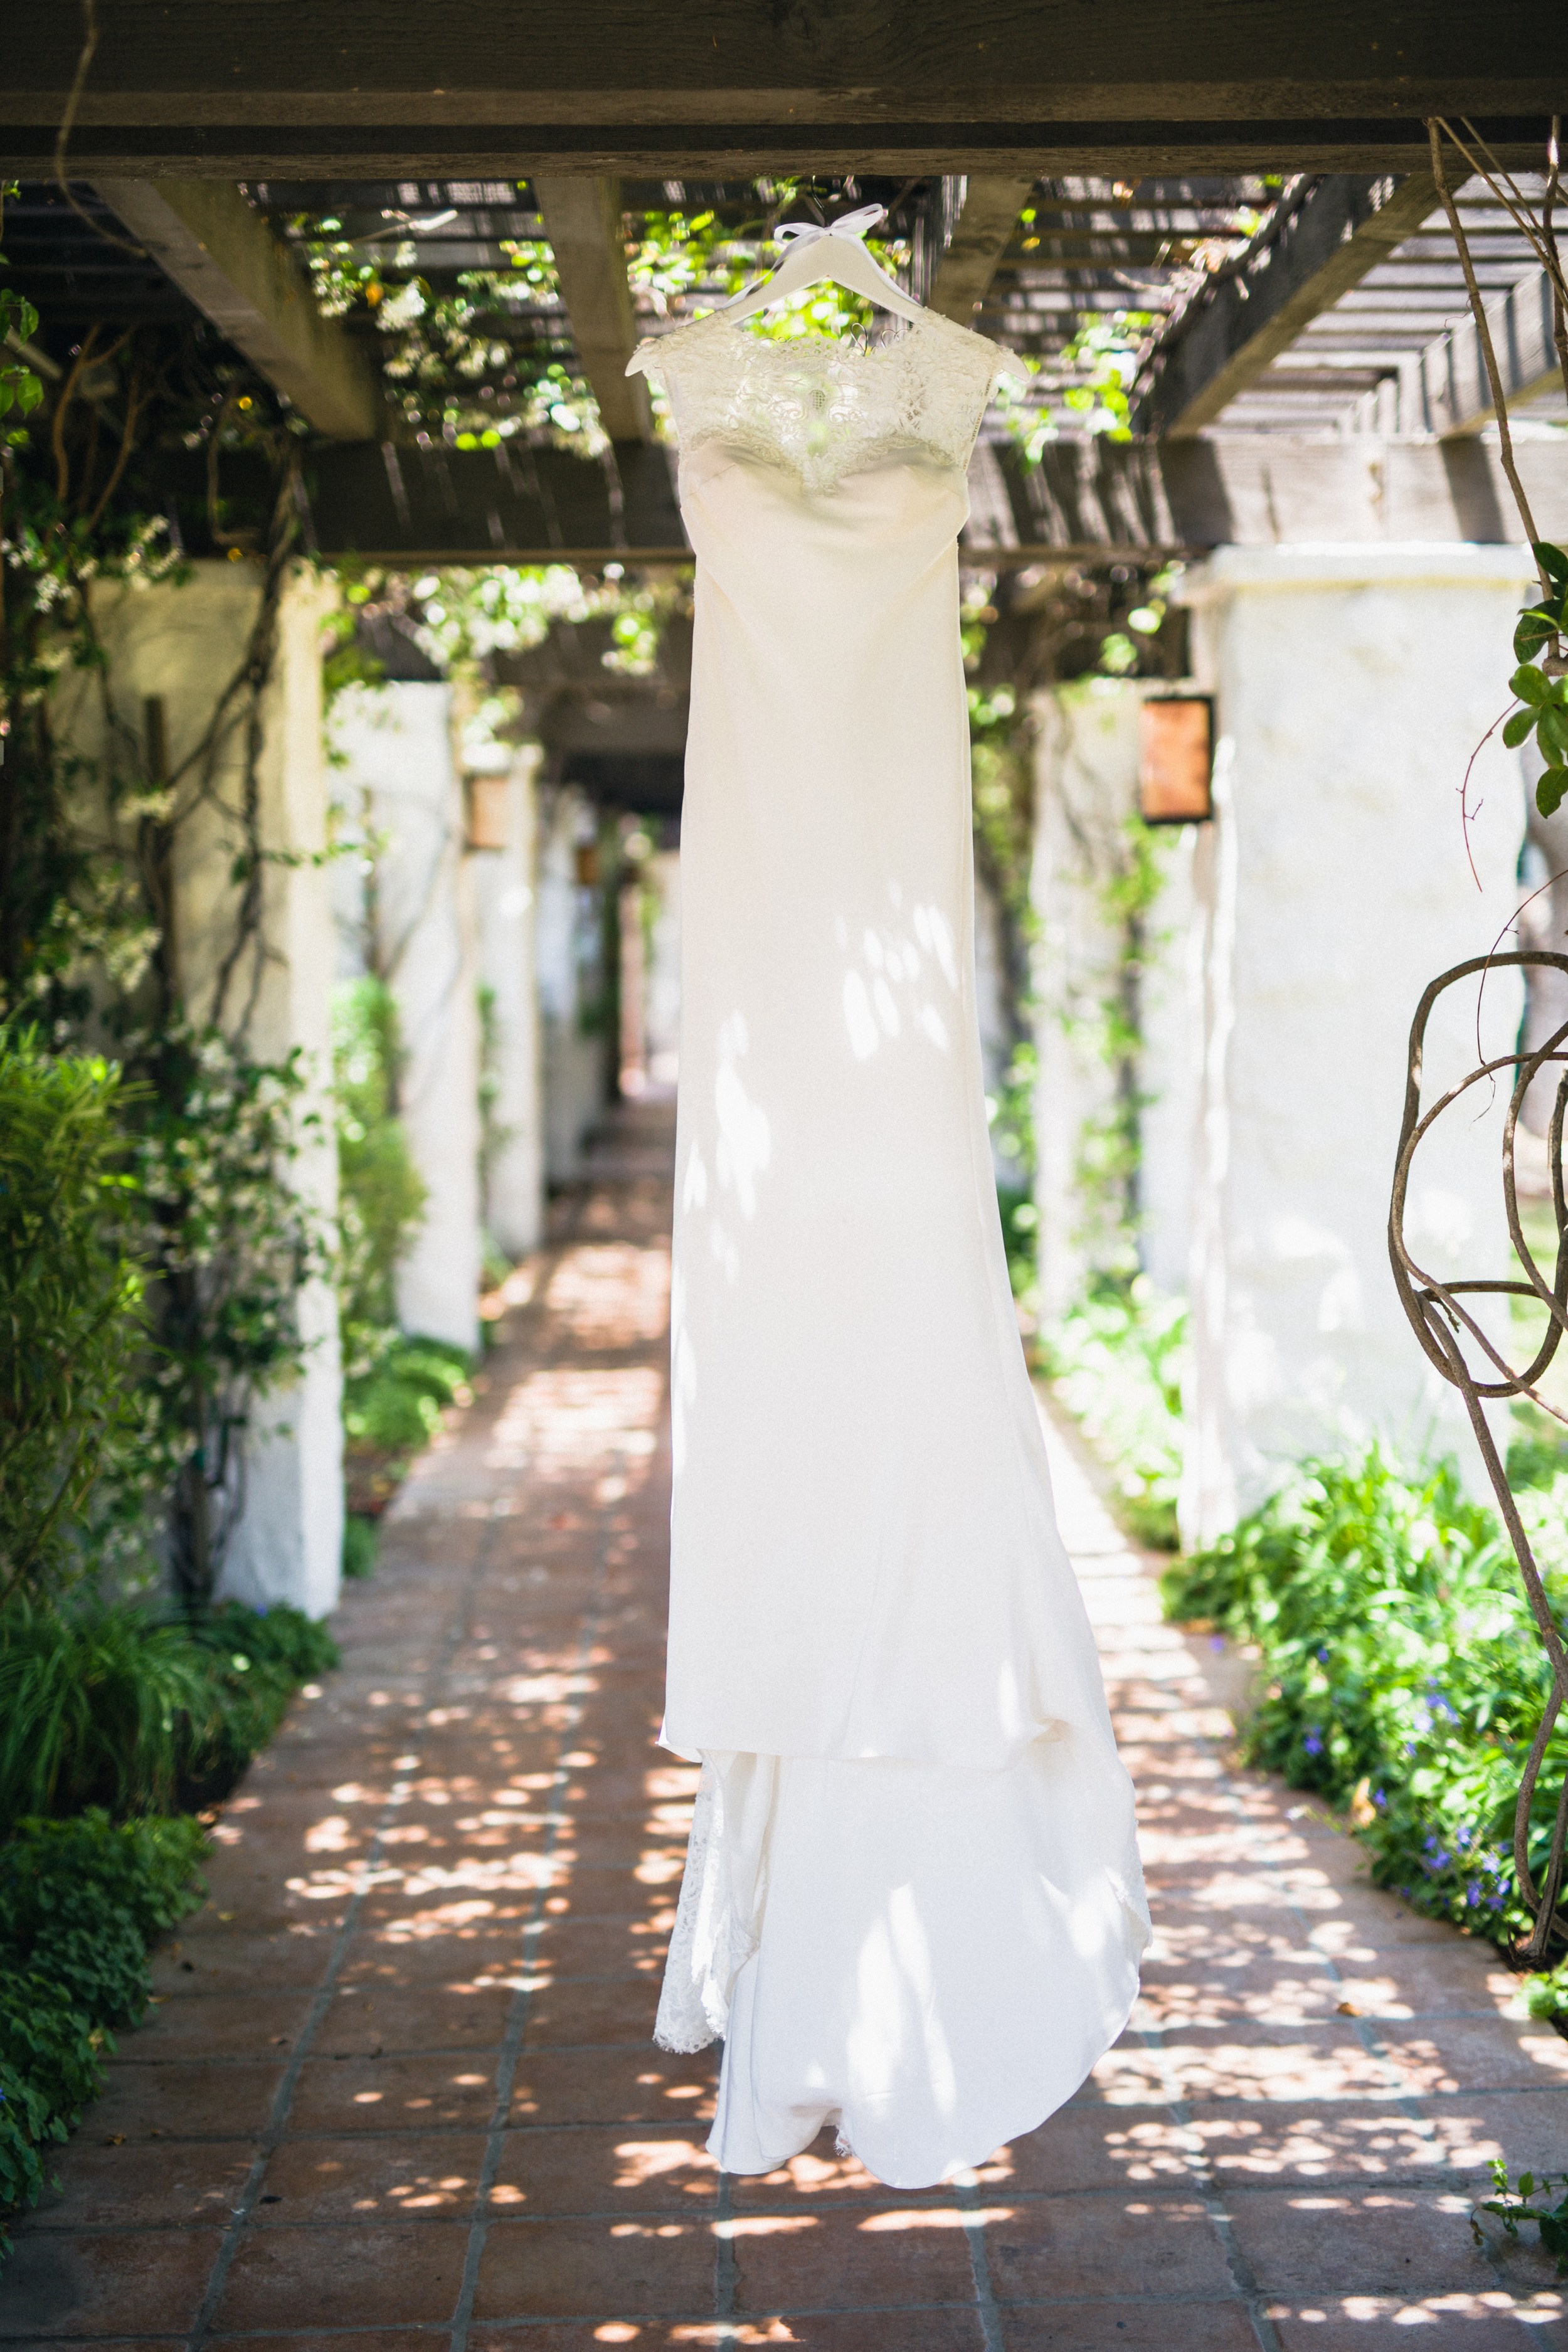 002 Hartley Botanica Wedding Photography Cotton Love Studios.jpg